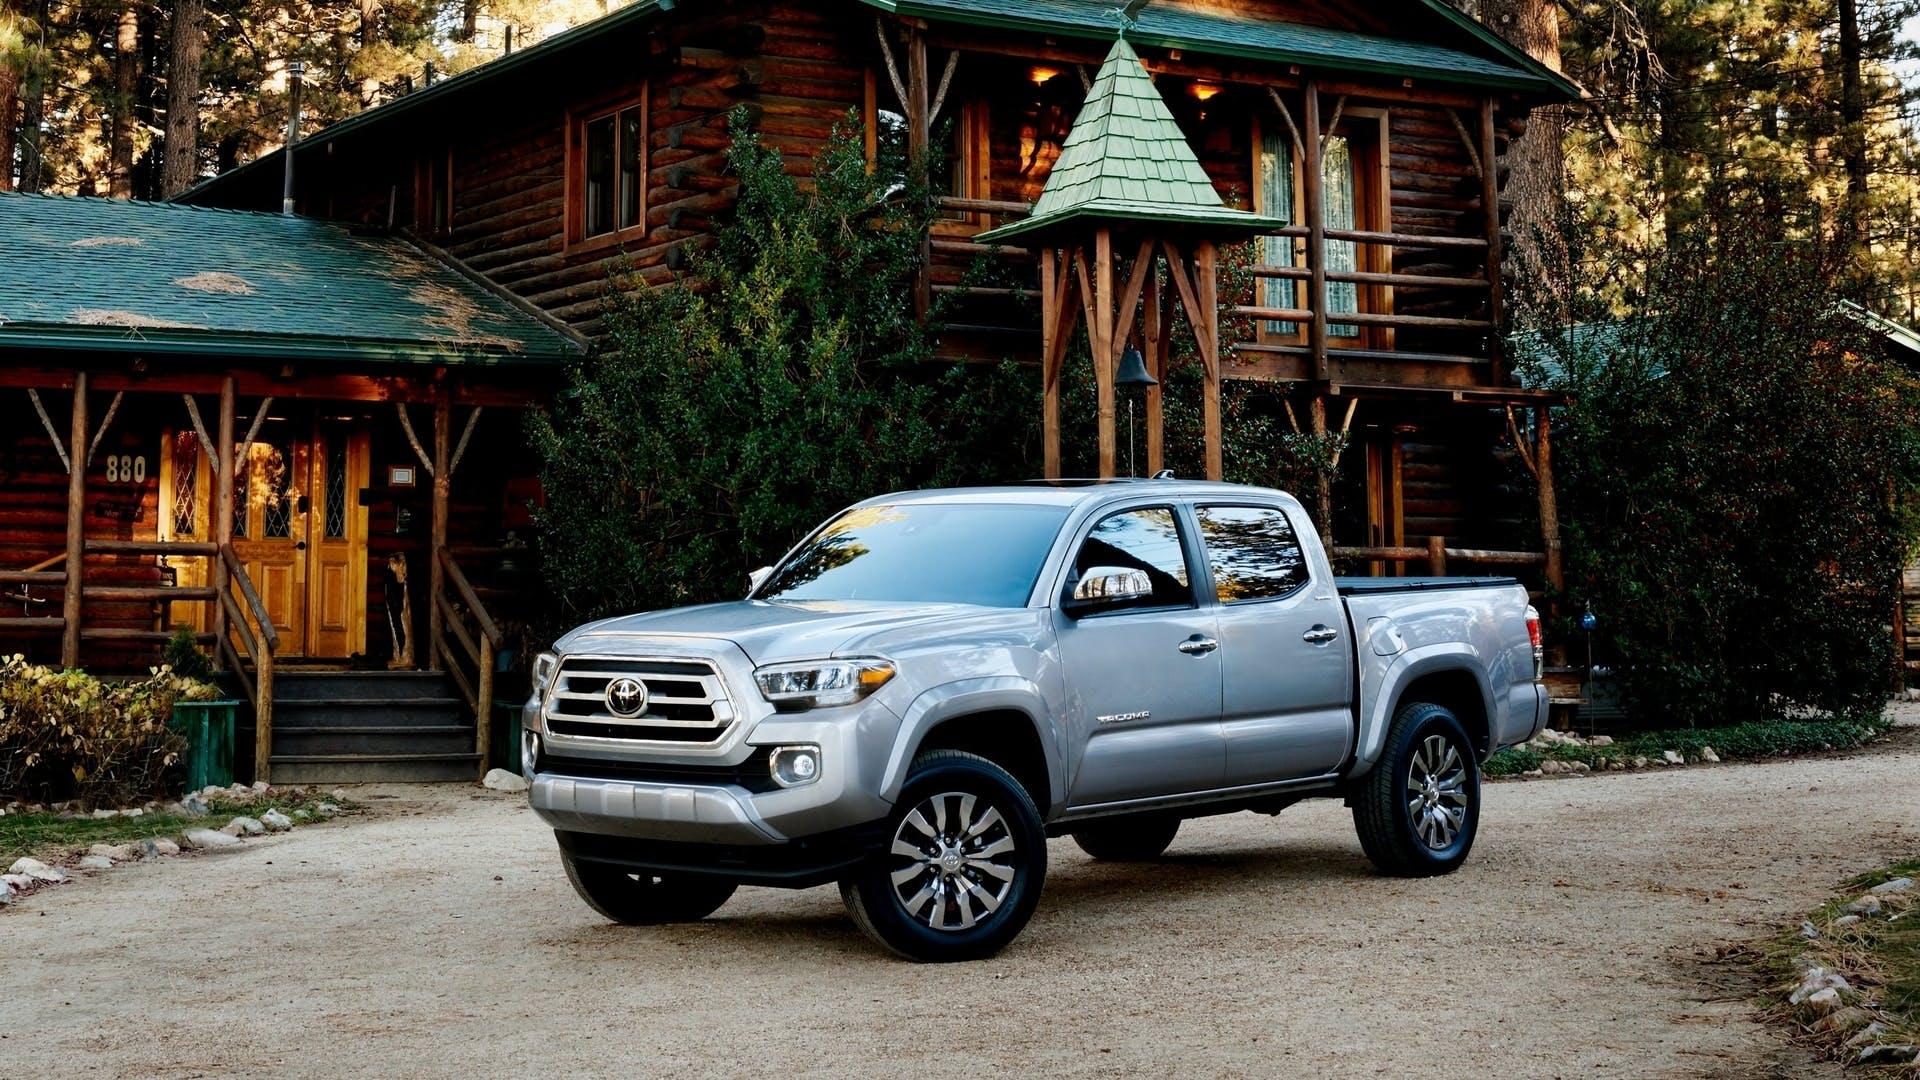 Buy, Lease, or Finance the 2020 Toyota Tacoma near Grove City PA